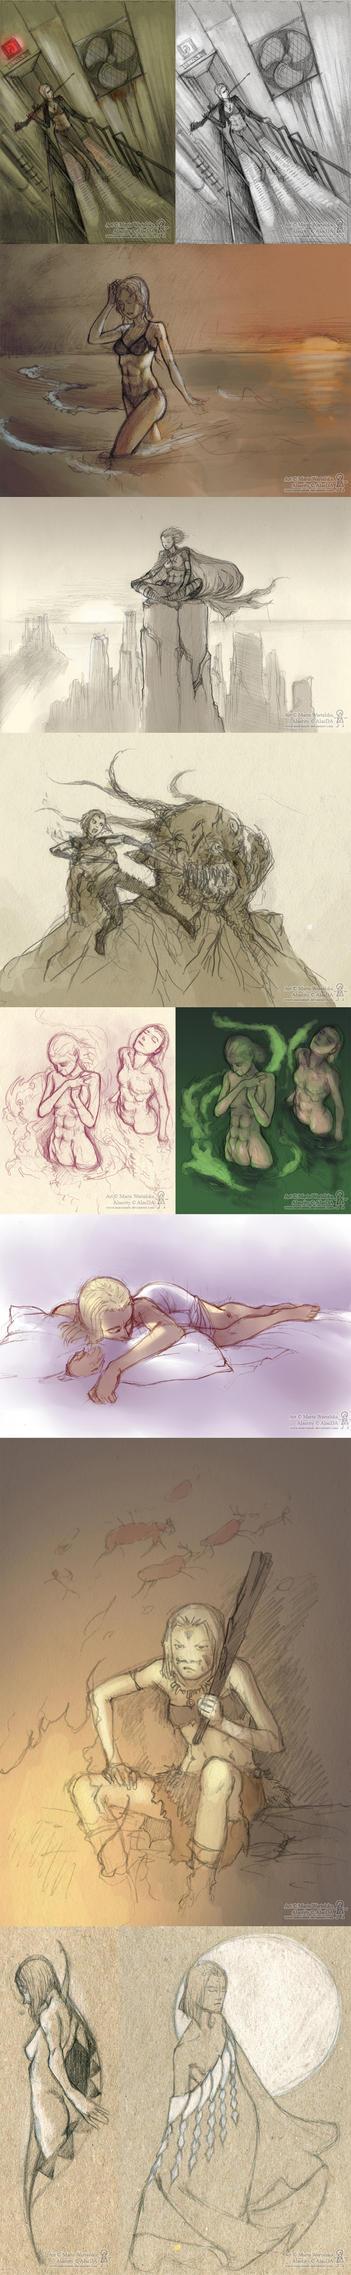 Alacrity sketchdump2 by Marcianek